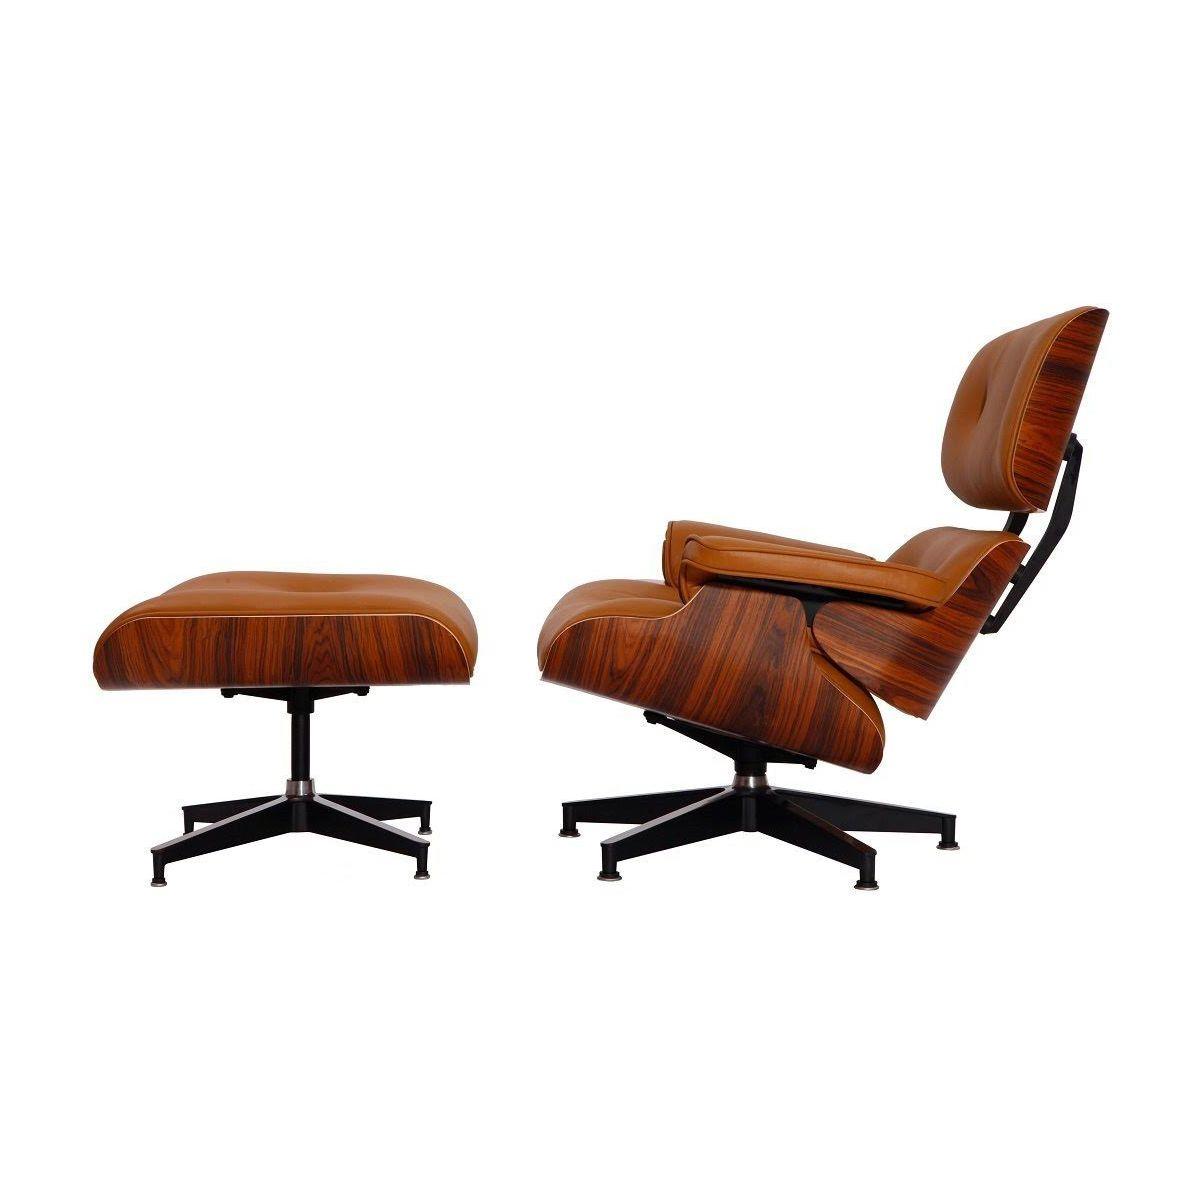 Eames Lounge Chair Ottoman In 2020 Eames Lounge Chair Replica